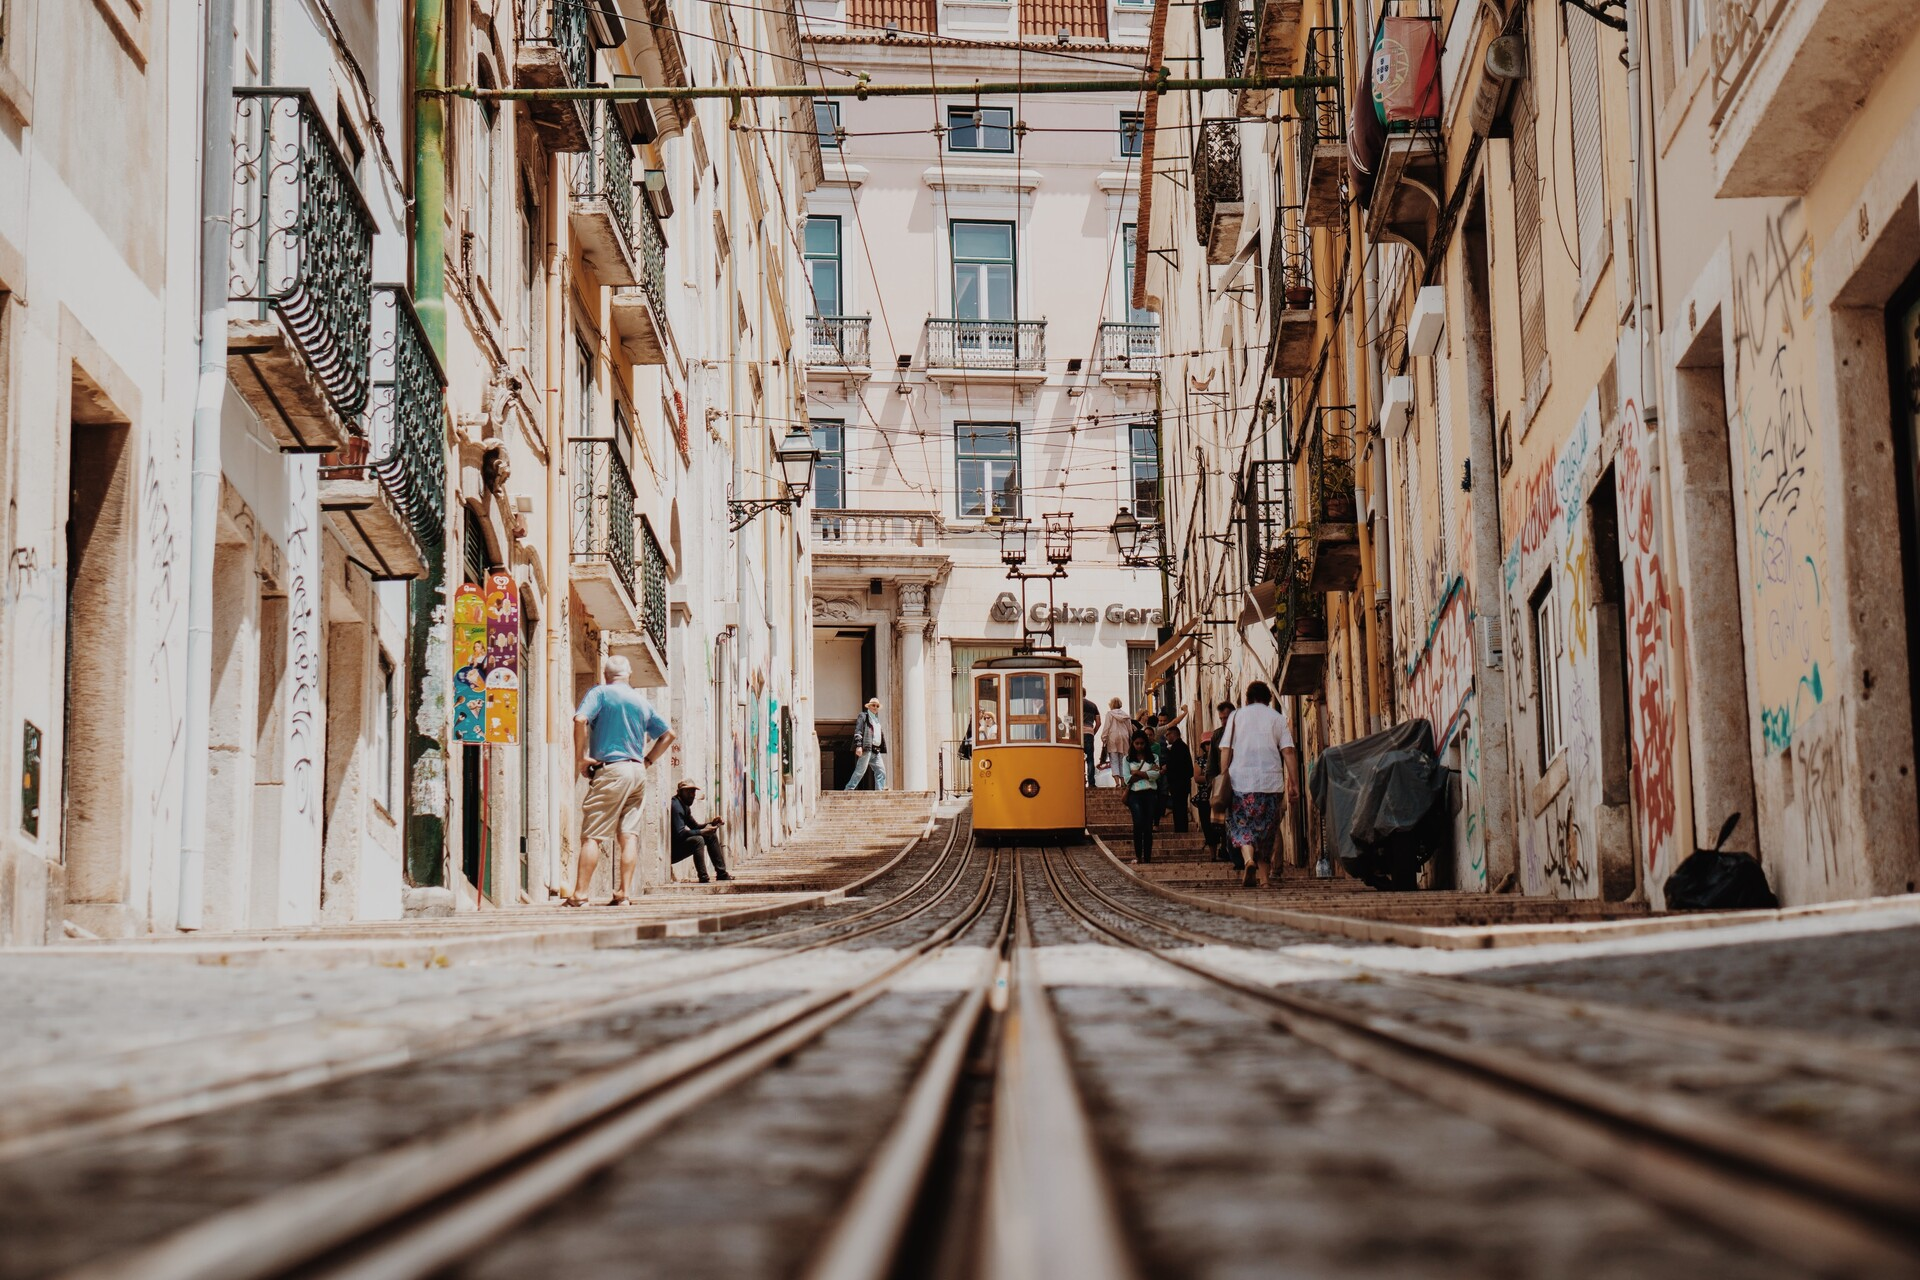 Lisbon, the best city to study Portuguese